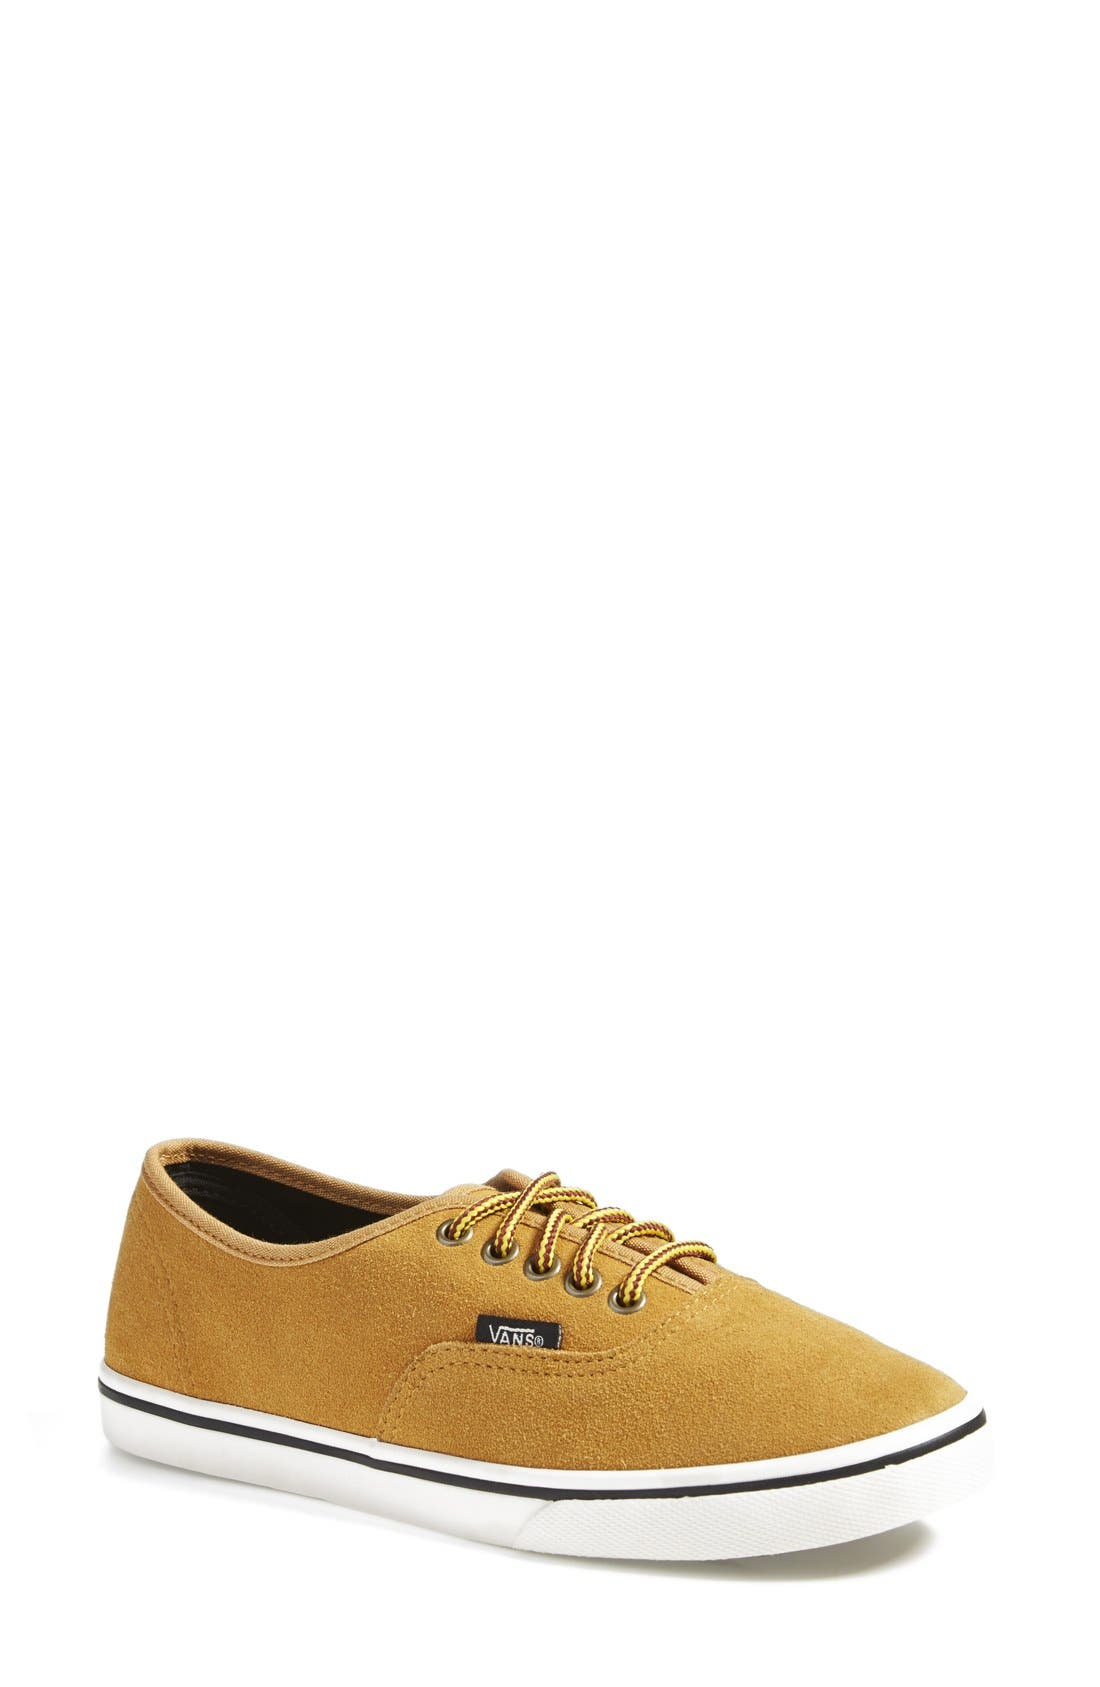 Alternate Image 1 Selected - Vans 'Authentic - Lo Pro' Suede Sneaker (Women)